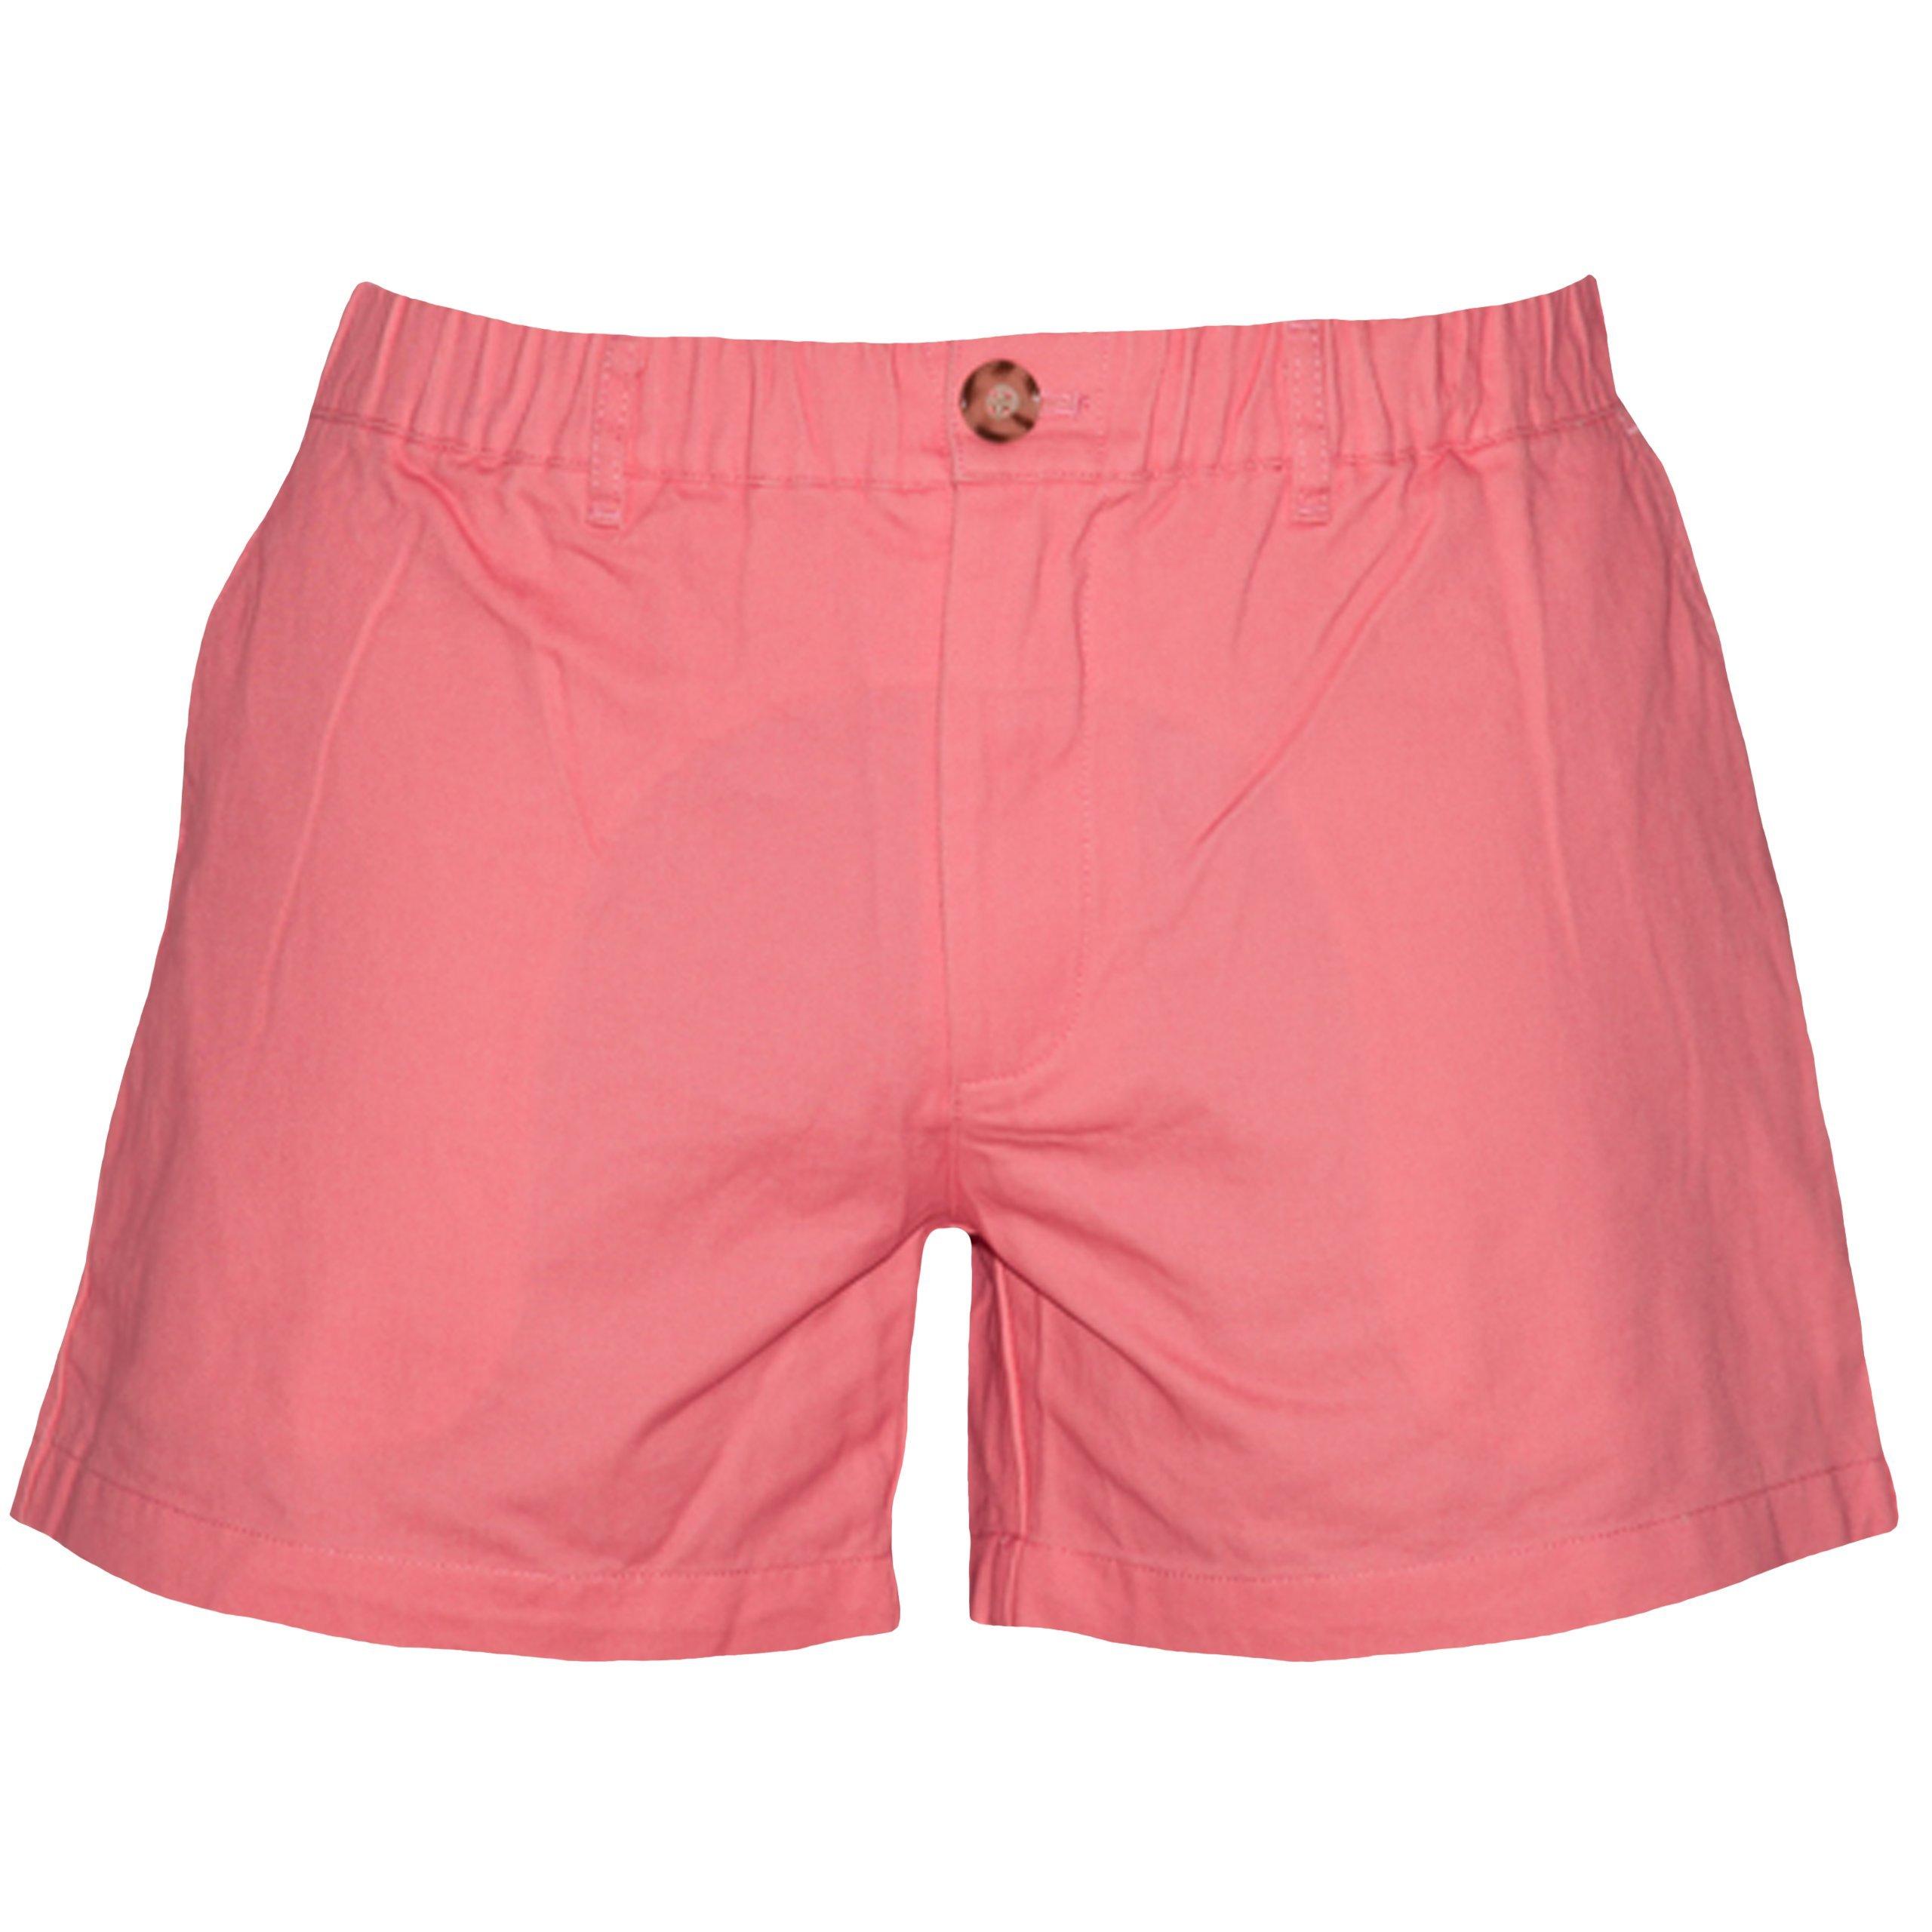 Meripex Apparel Men's 5.5 inch Elastic-Waist Short Shorts (Small, Coral)